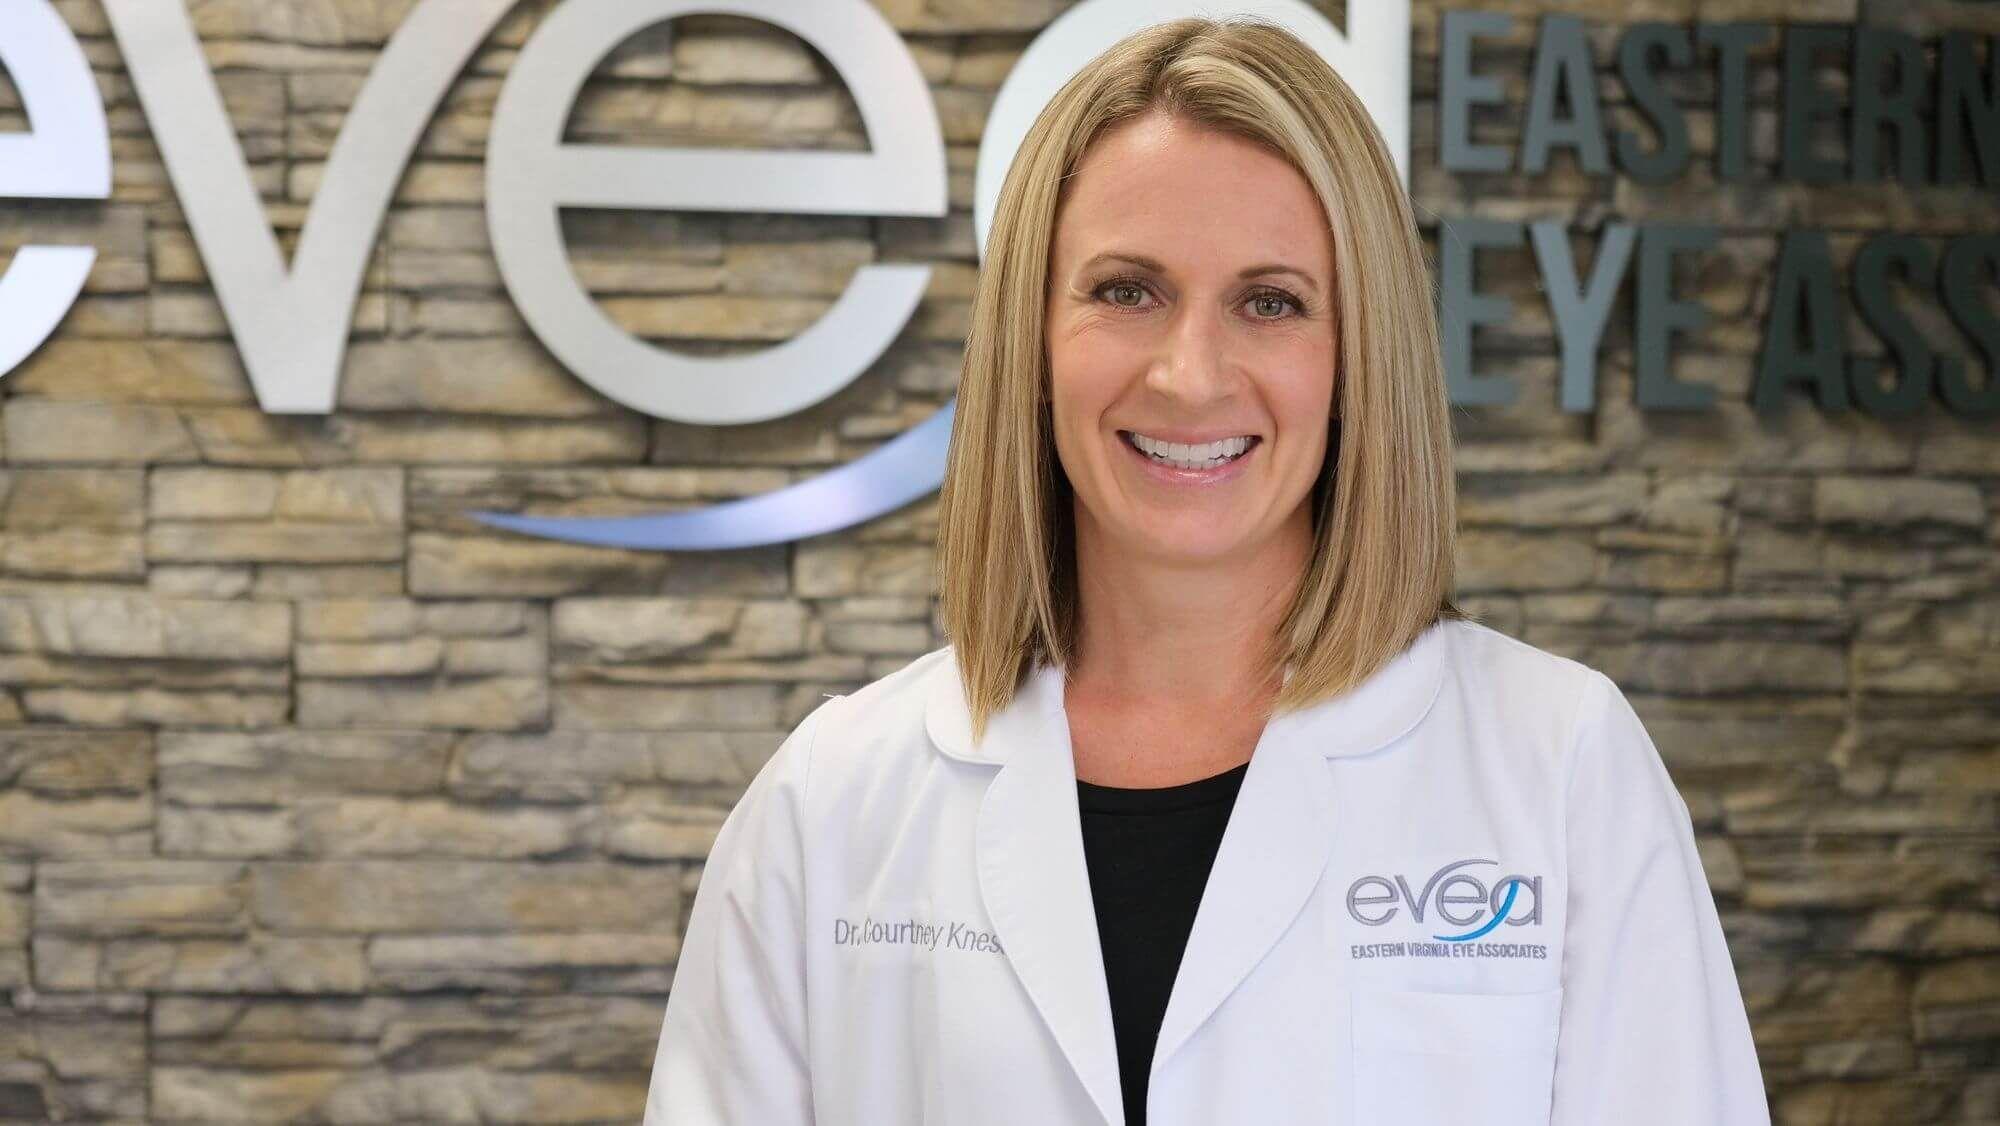 Dr. Courtney Kness